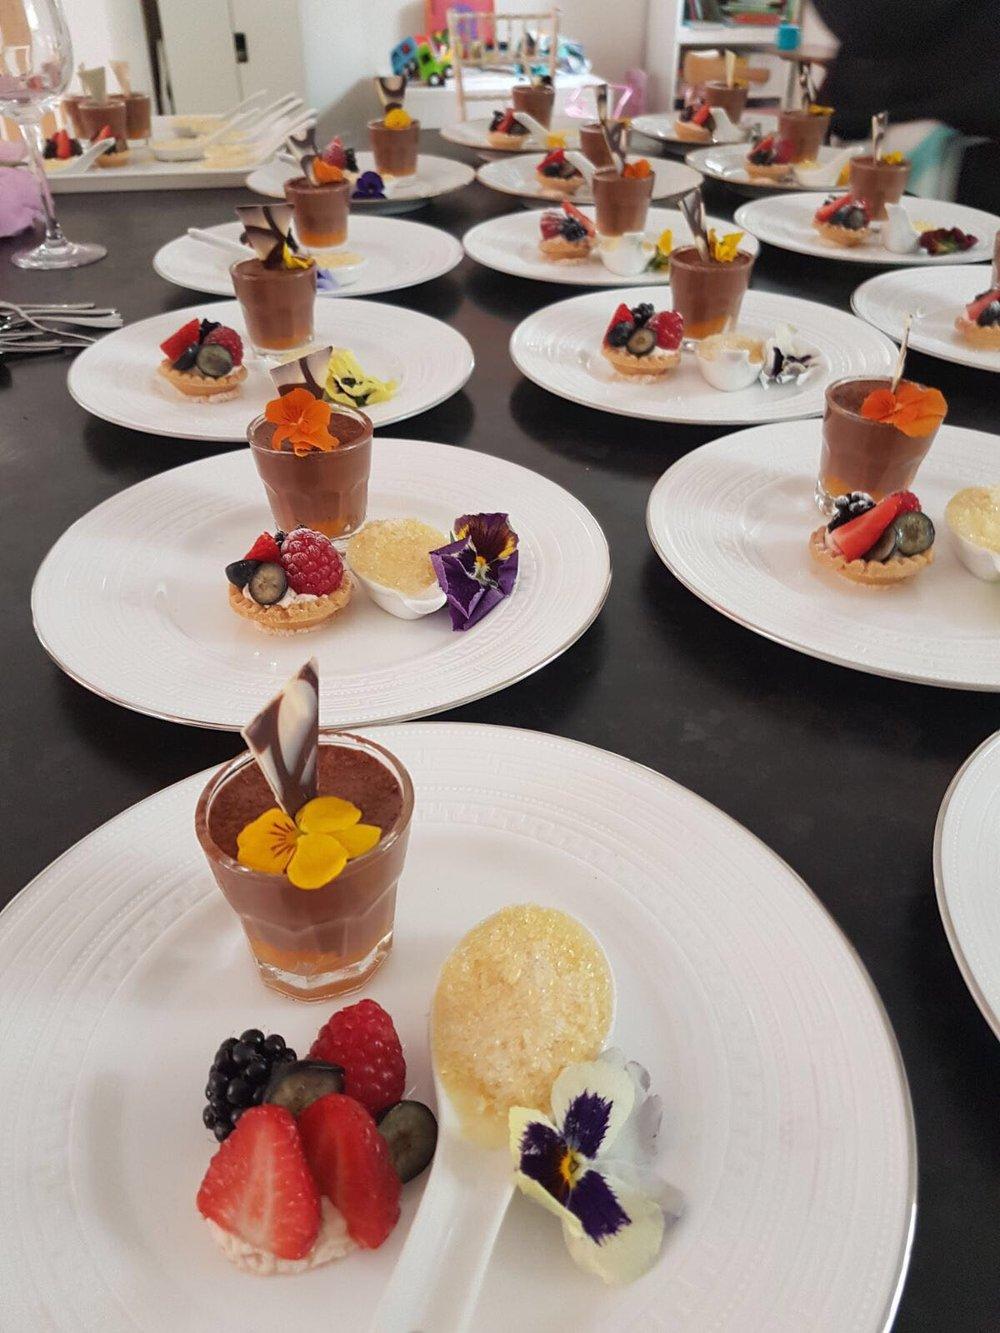 puddings-sarah-symington-catering-7.JPG